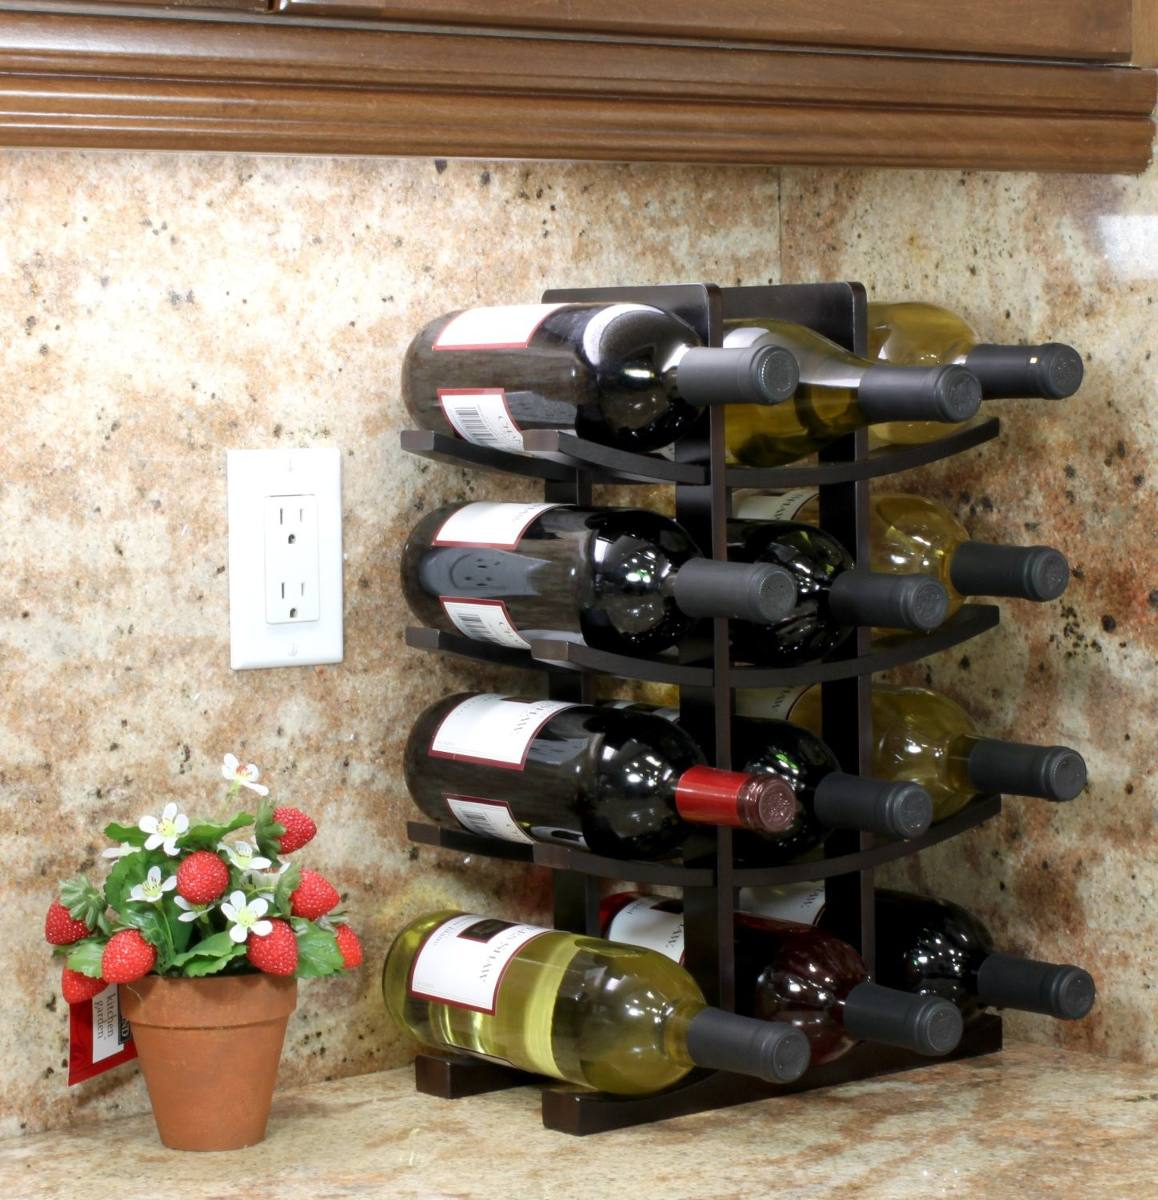 Cava De Madera Fina Porta 12 Botellas De Vino 890 00